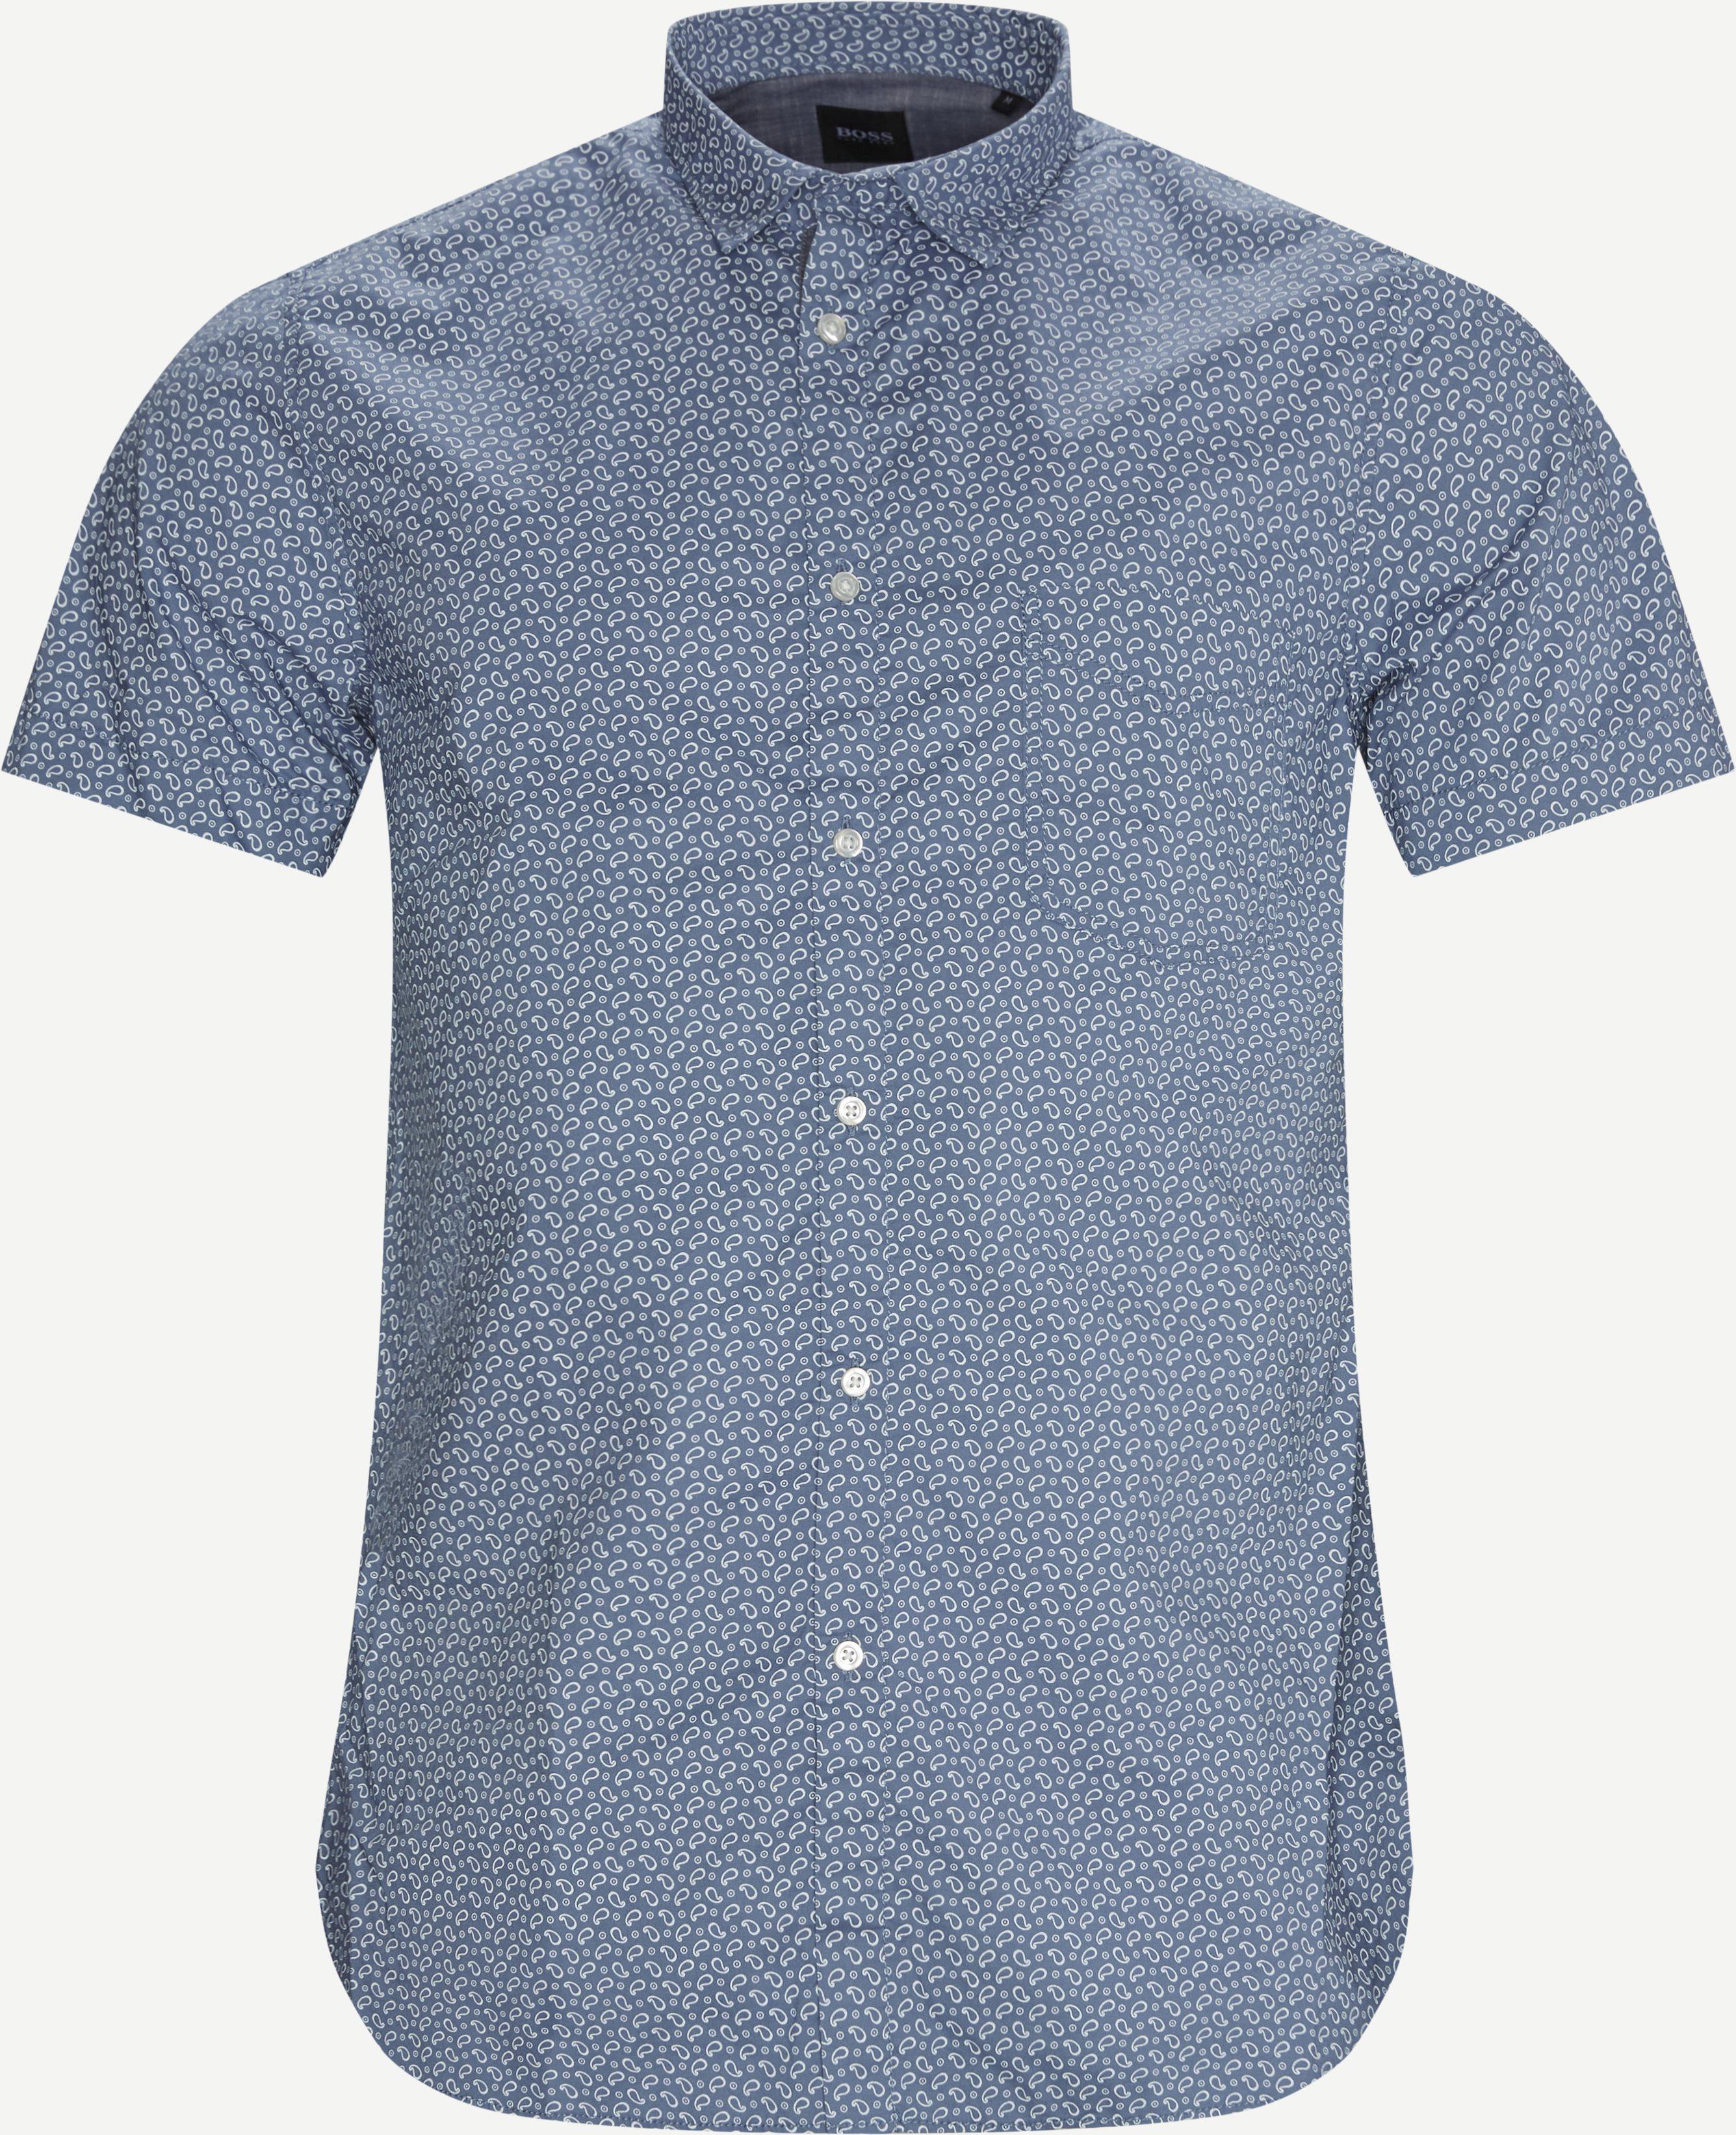 Magneton KÆ Skjorte - Kortärmade skjortor - Slim fit - Blå